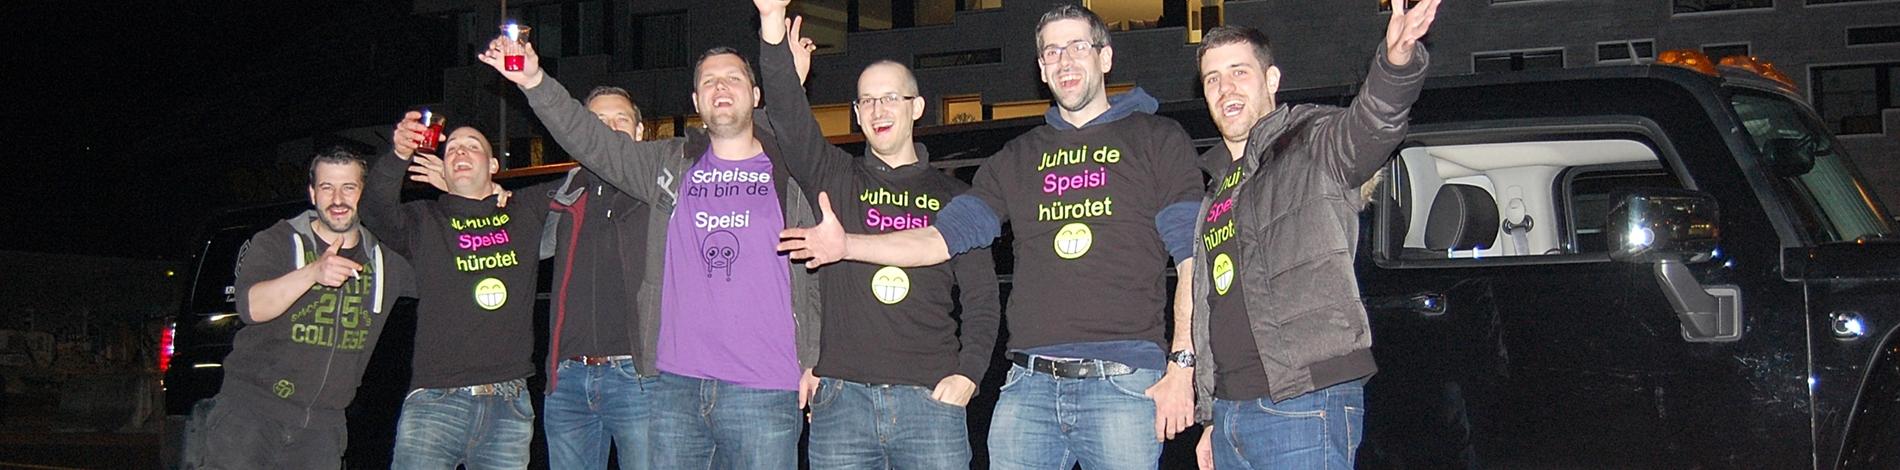 Polterabend Tshirt Slider01